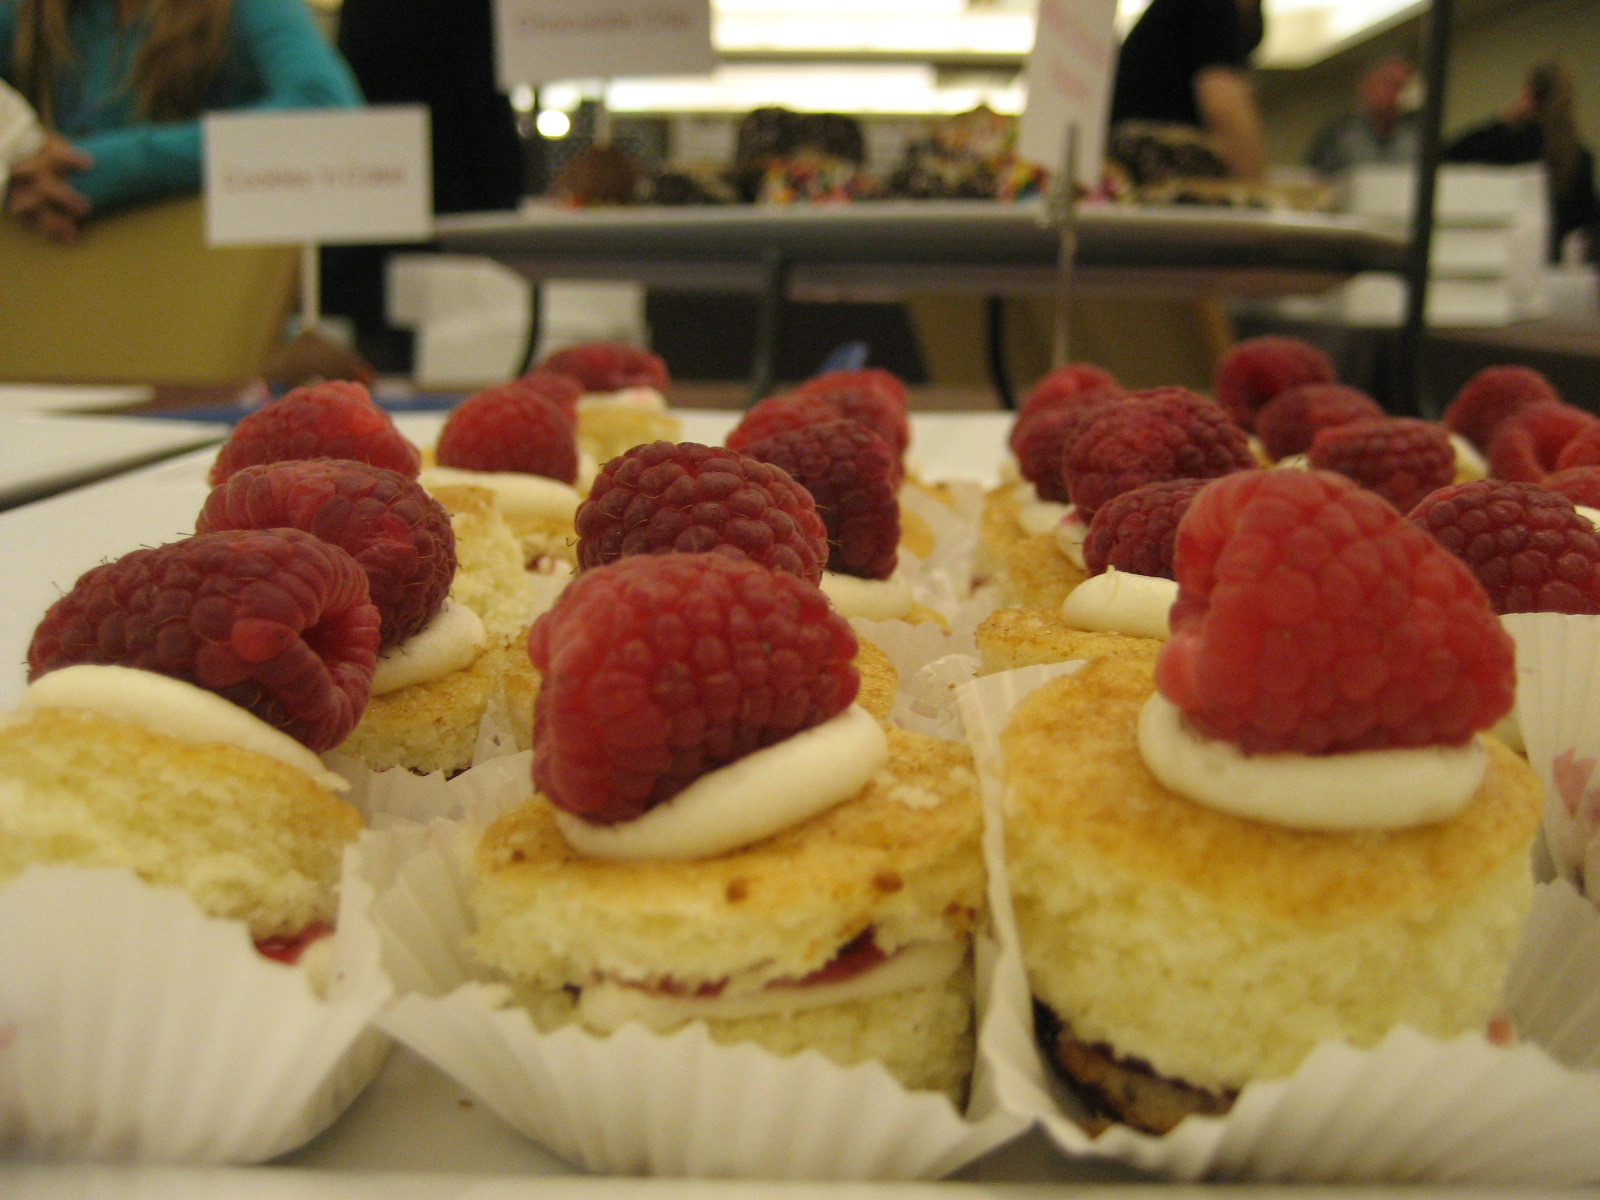 New England Desserts  New England Dessert Showcase 2010 – Part 1